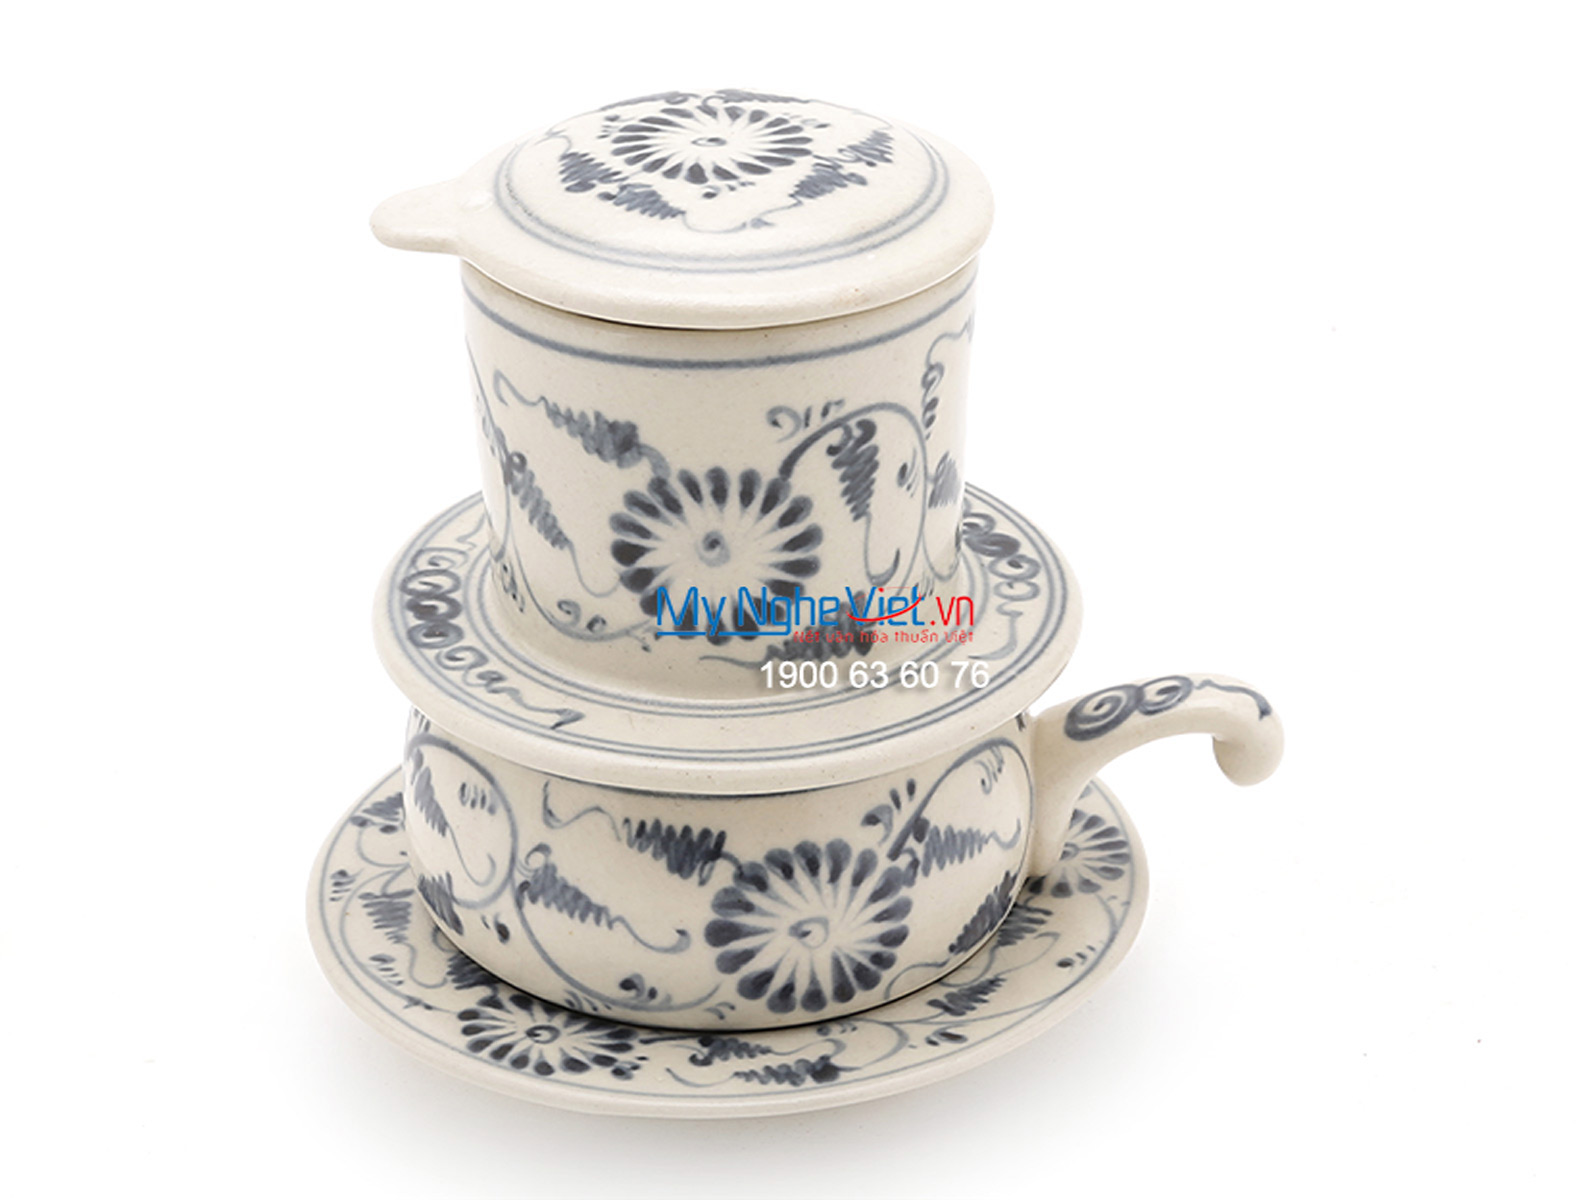 Phin Cafe Gốm Vẽ Hoa Cúc Xanh Thấp MNV-CF005/1